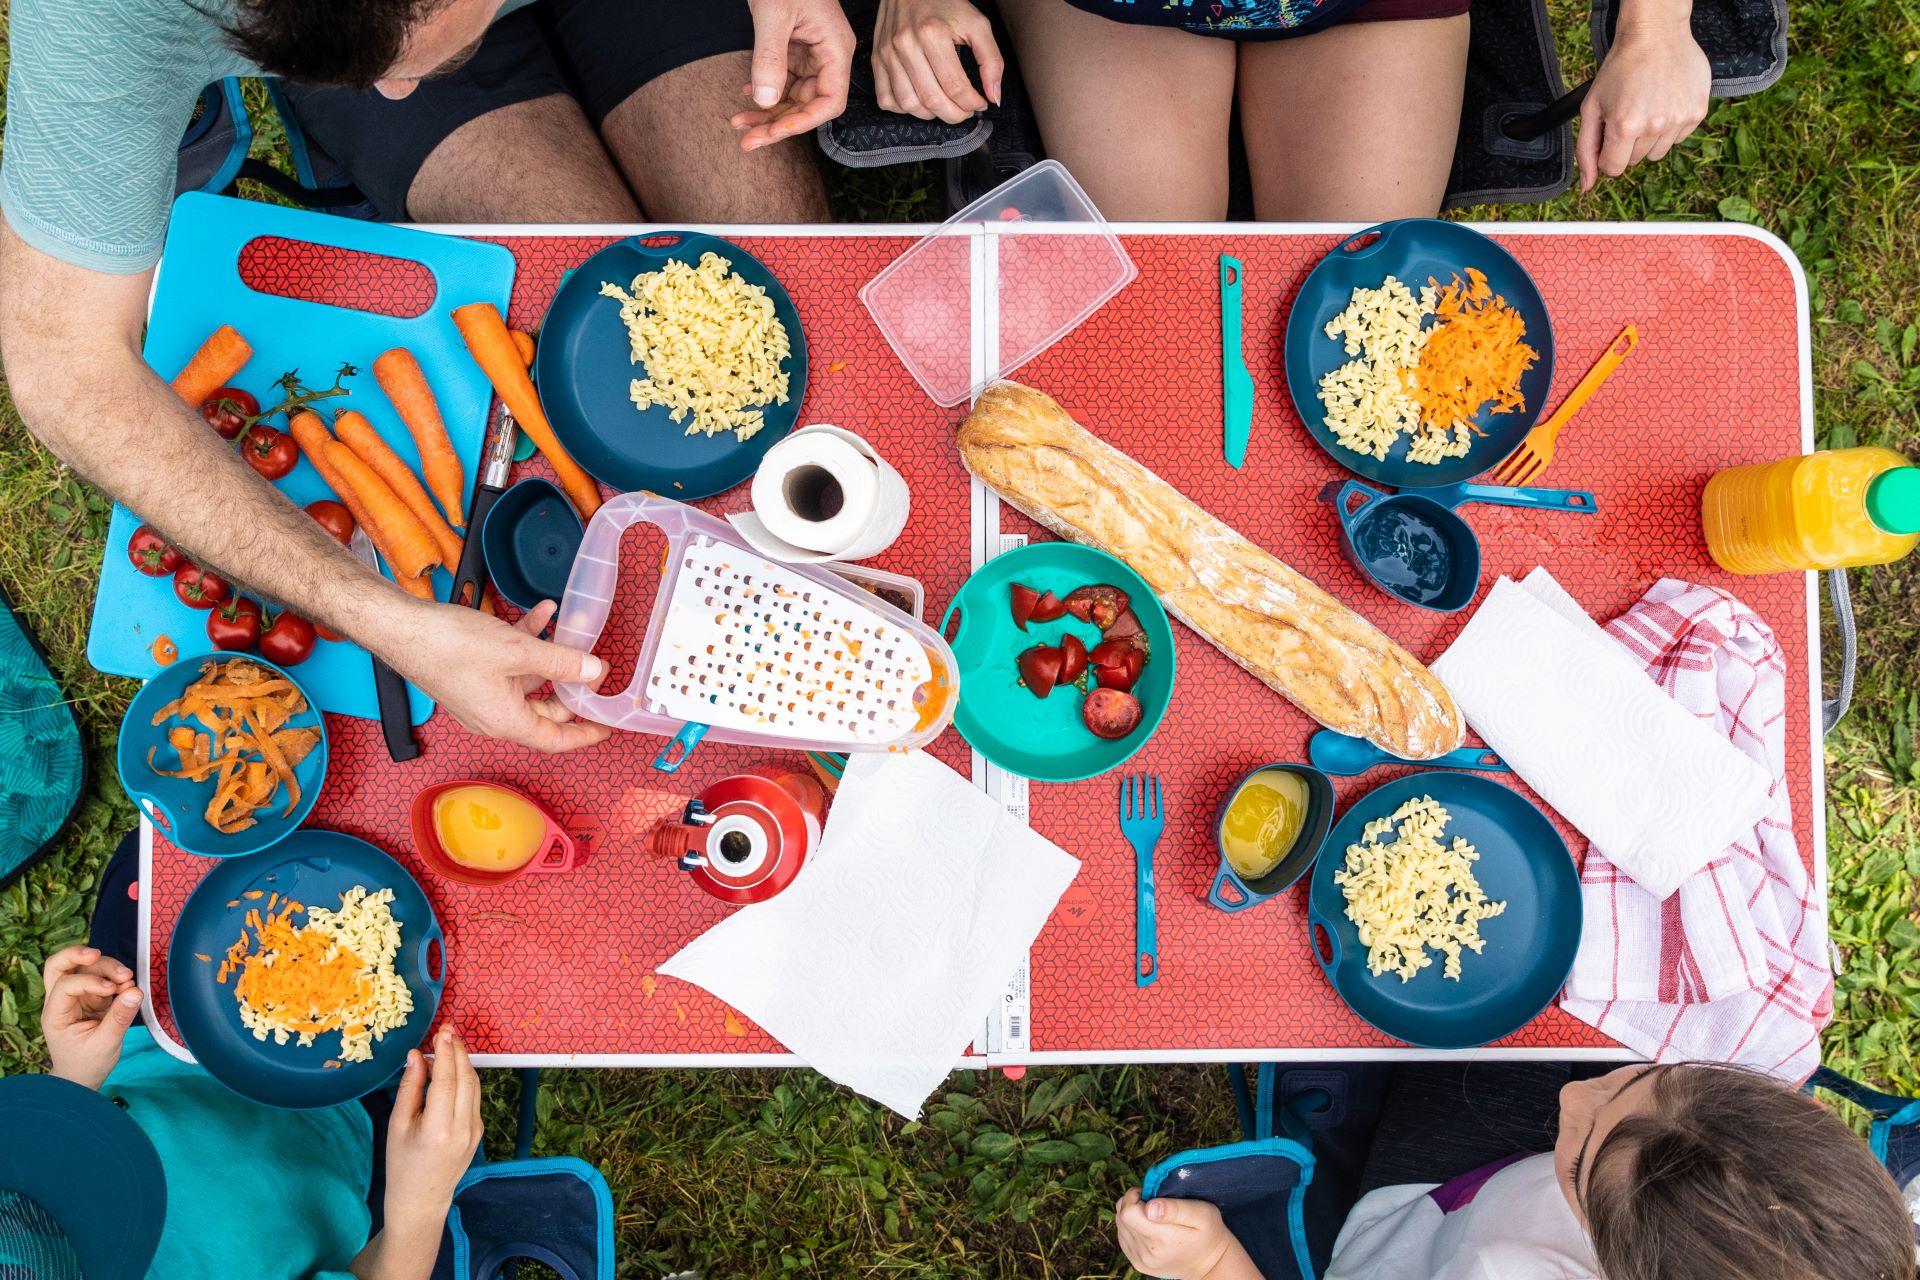 12 Camping Meal Ideas: A Campfire Menu